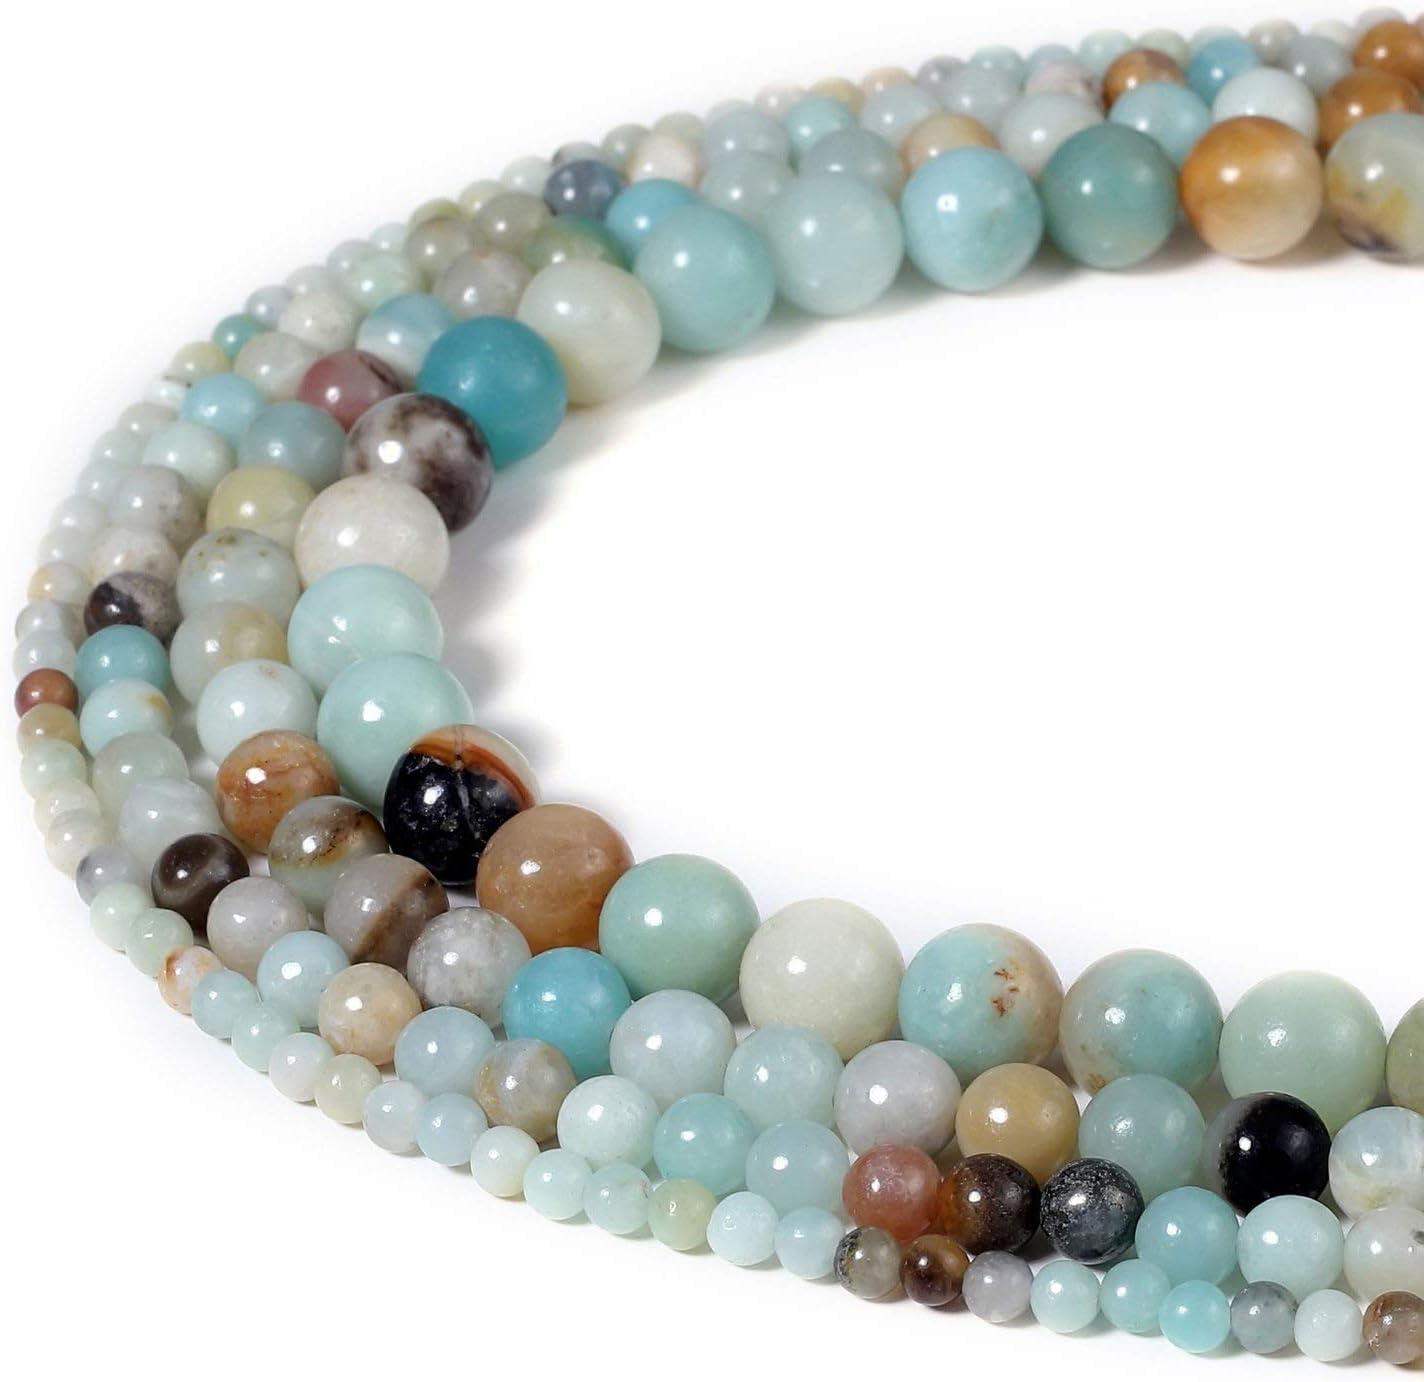 Gemstone Findings White Gemstone Beads 6mm Round Beads Jewelry Beads Loose Beads Jade Bead Strands Full 15 inch Strand